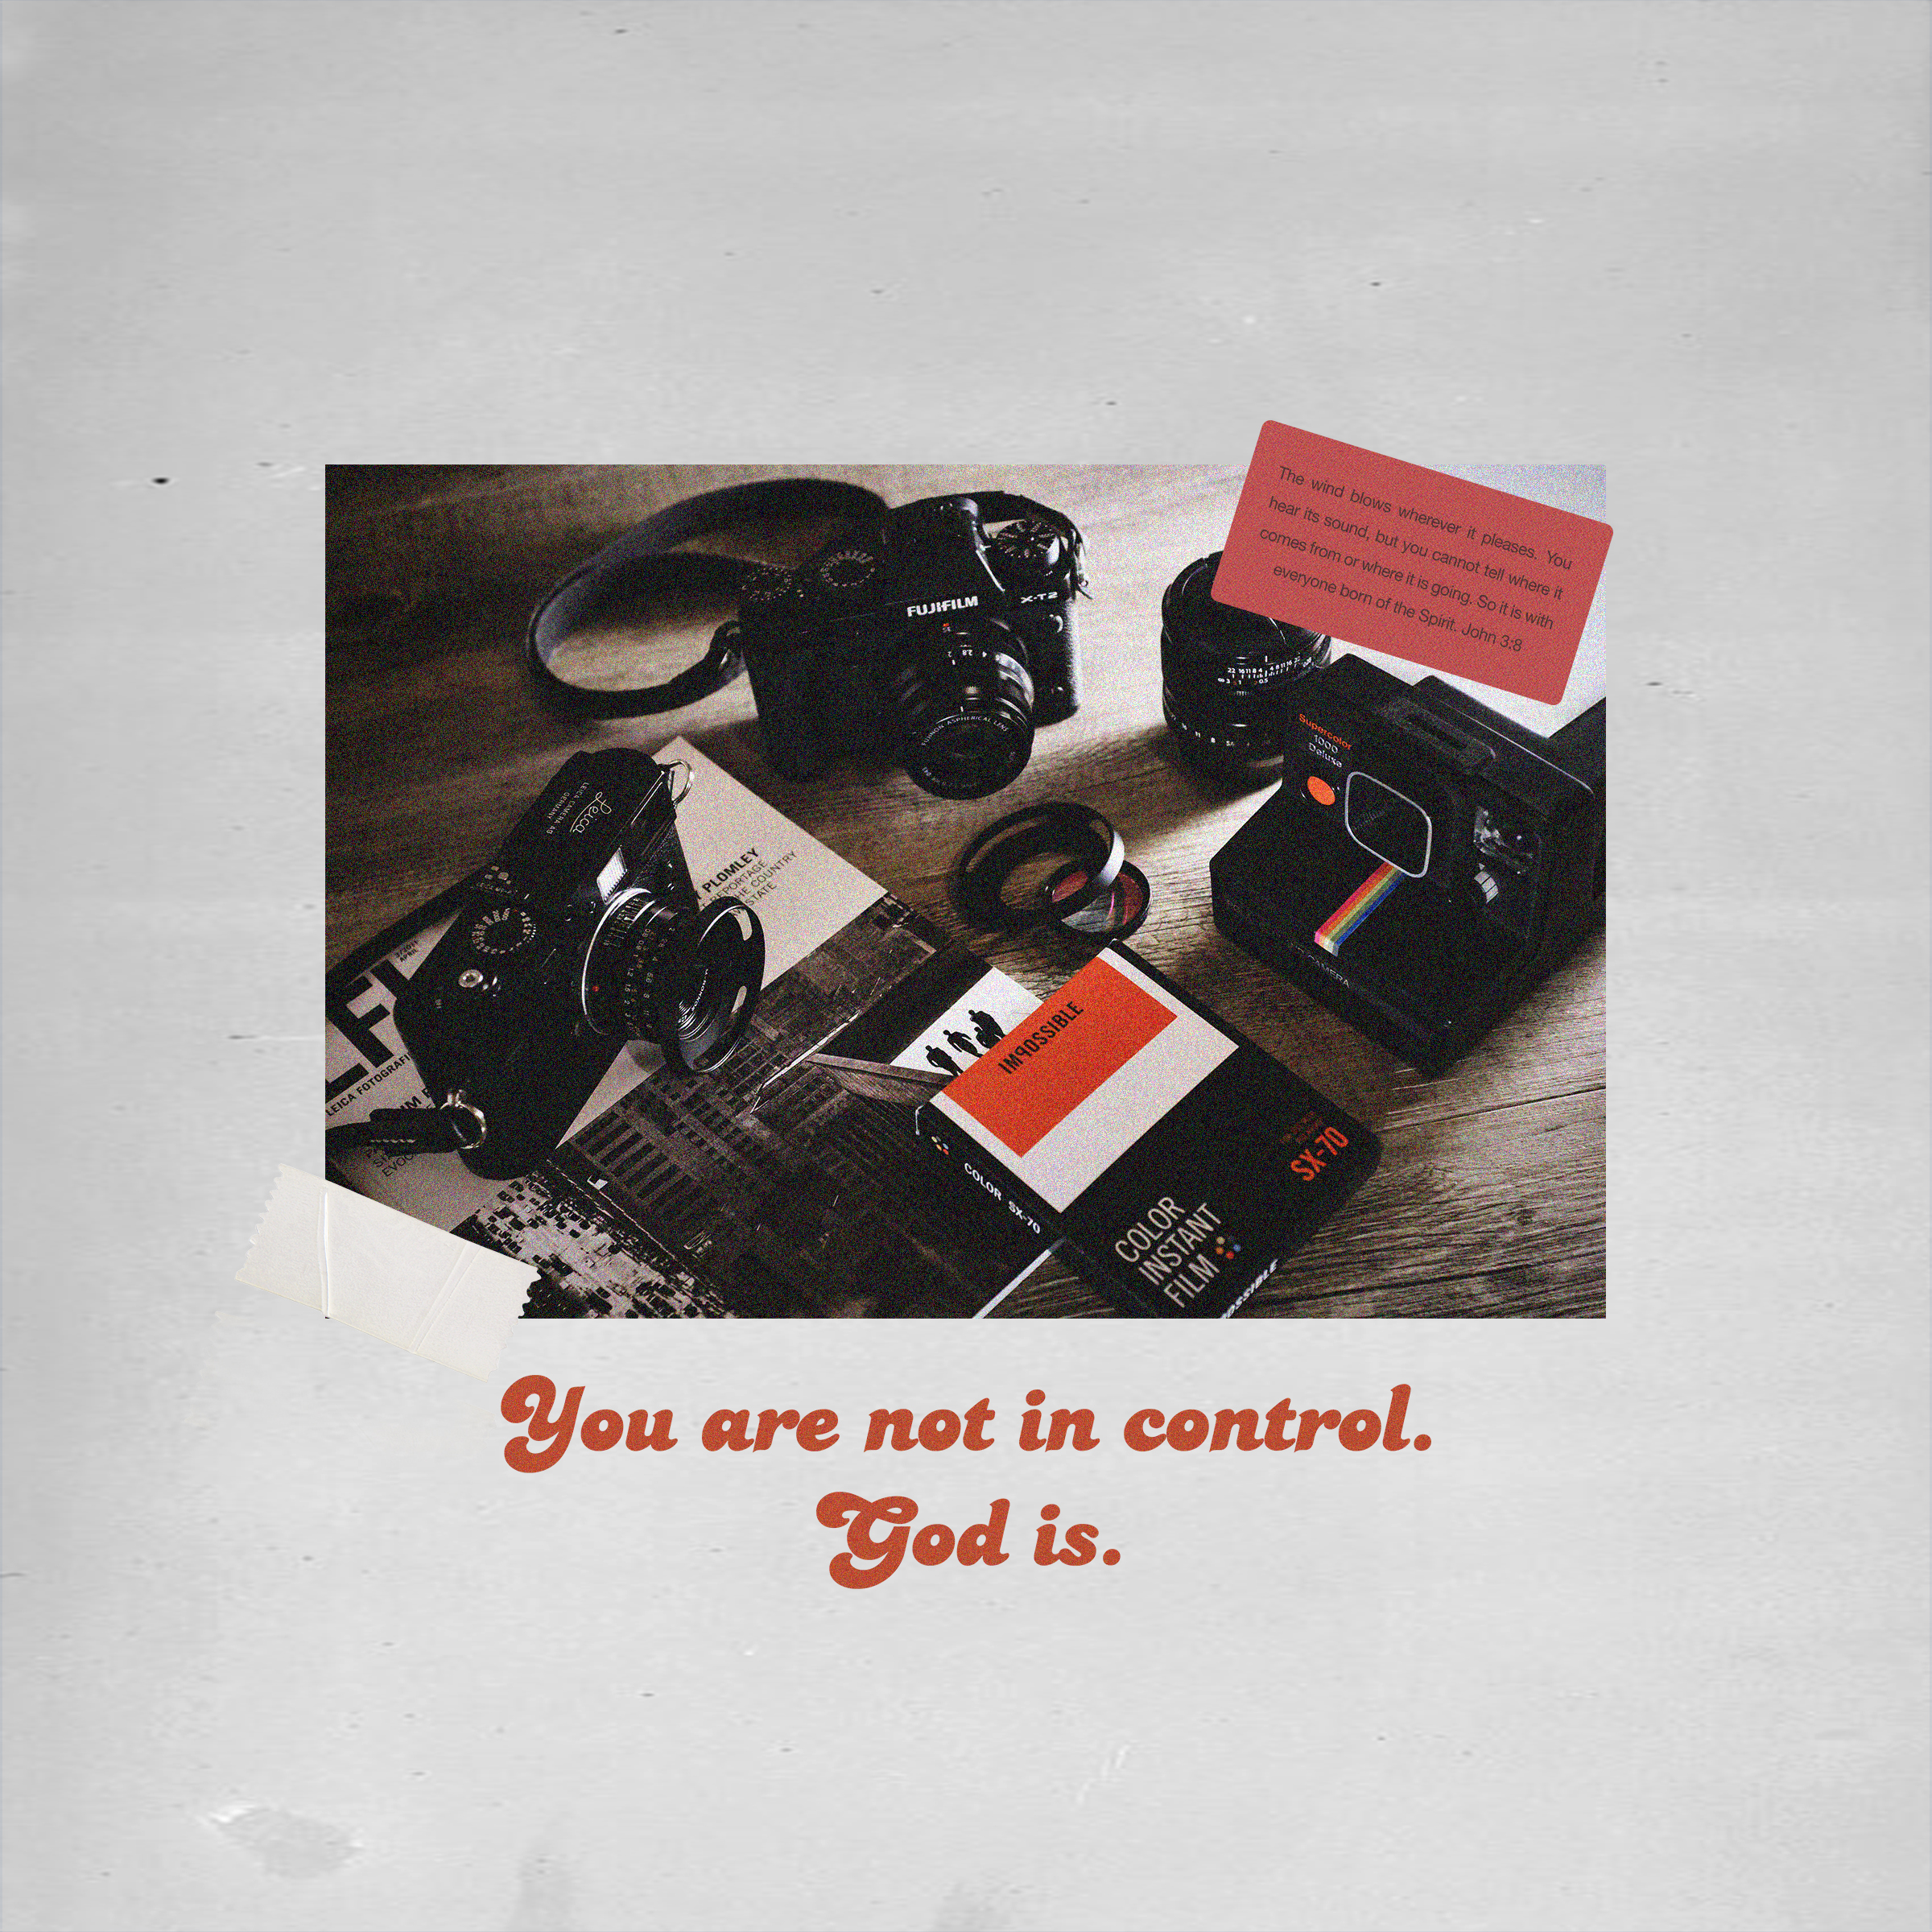 control_Instagrampost.jpg